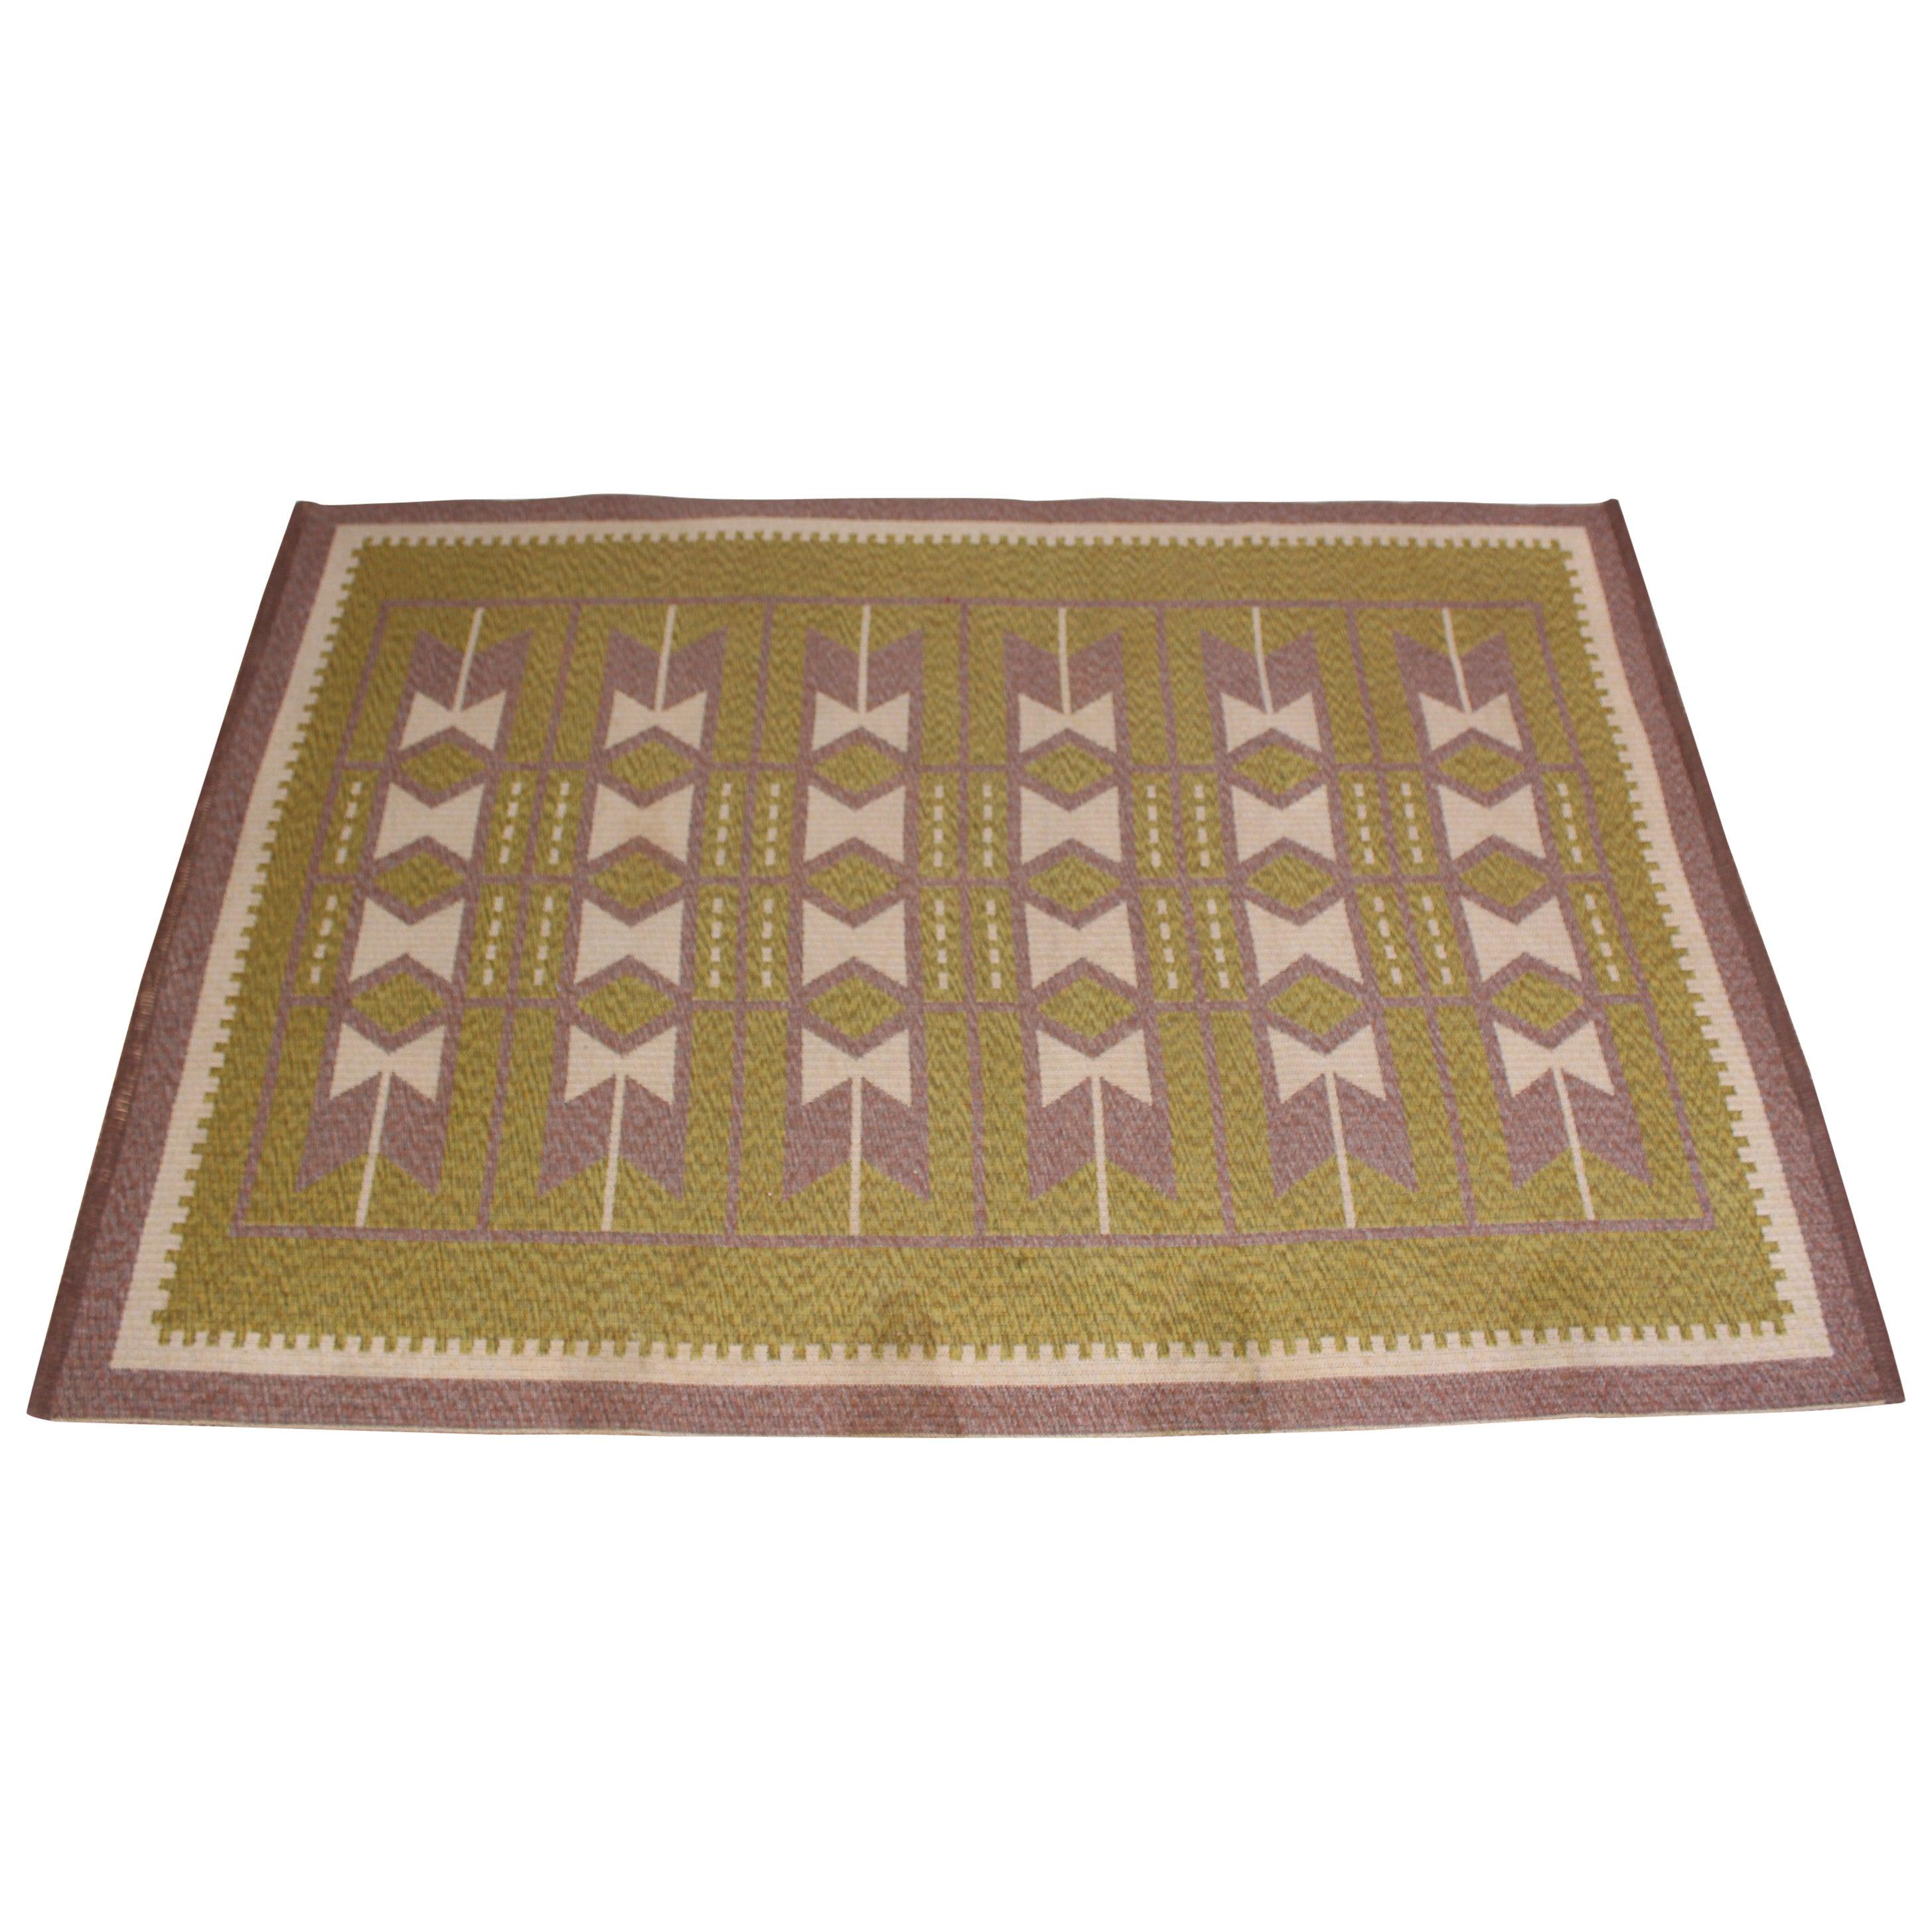 Midcentury Swedish Flat Weave Carpet (Dubble Weave), 1950s